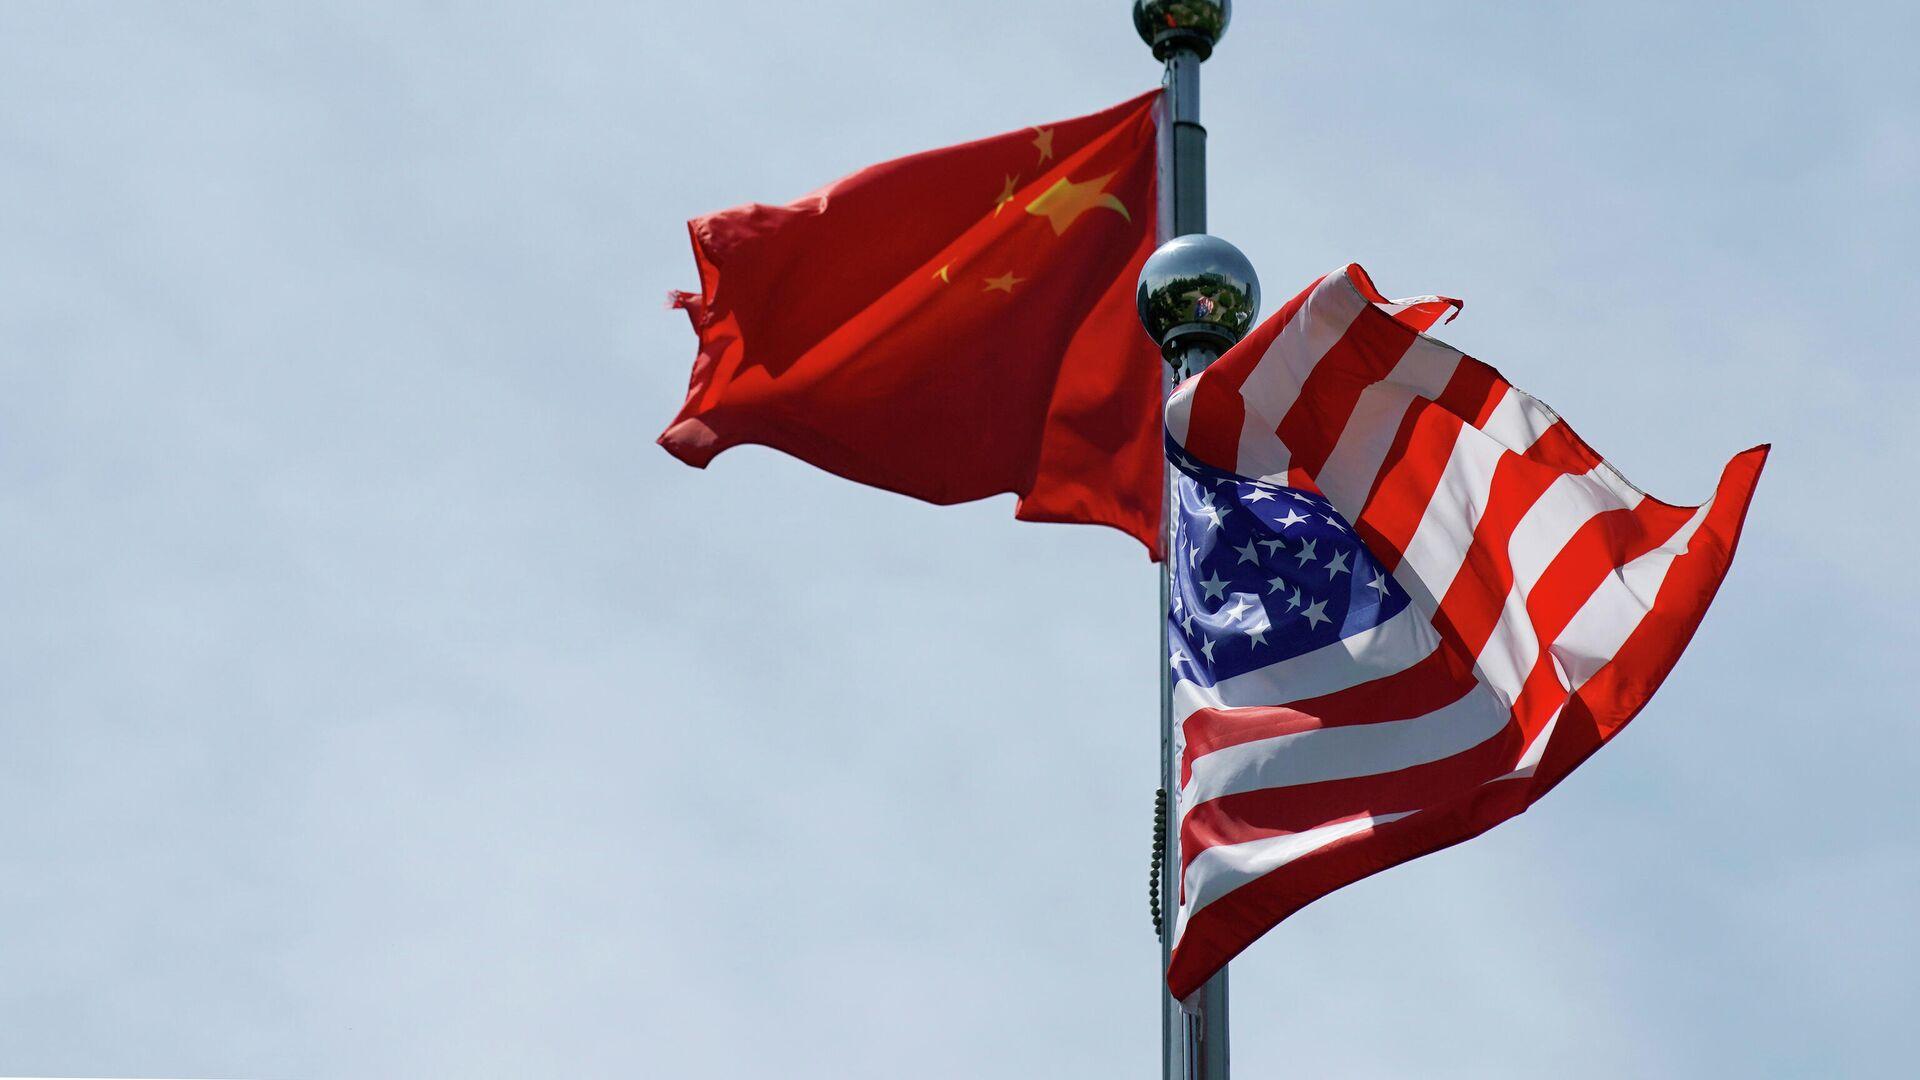 Флаги США и Китая - РИА Новости, 1920, 13.09.2020